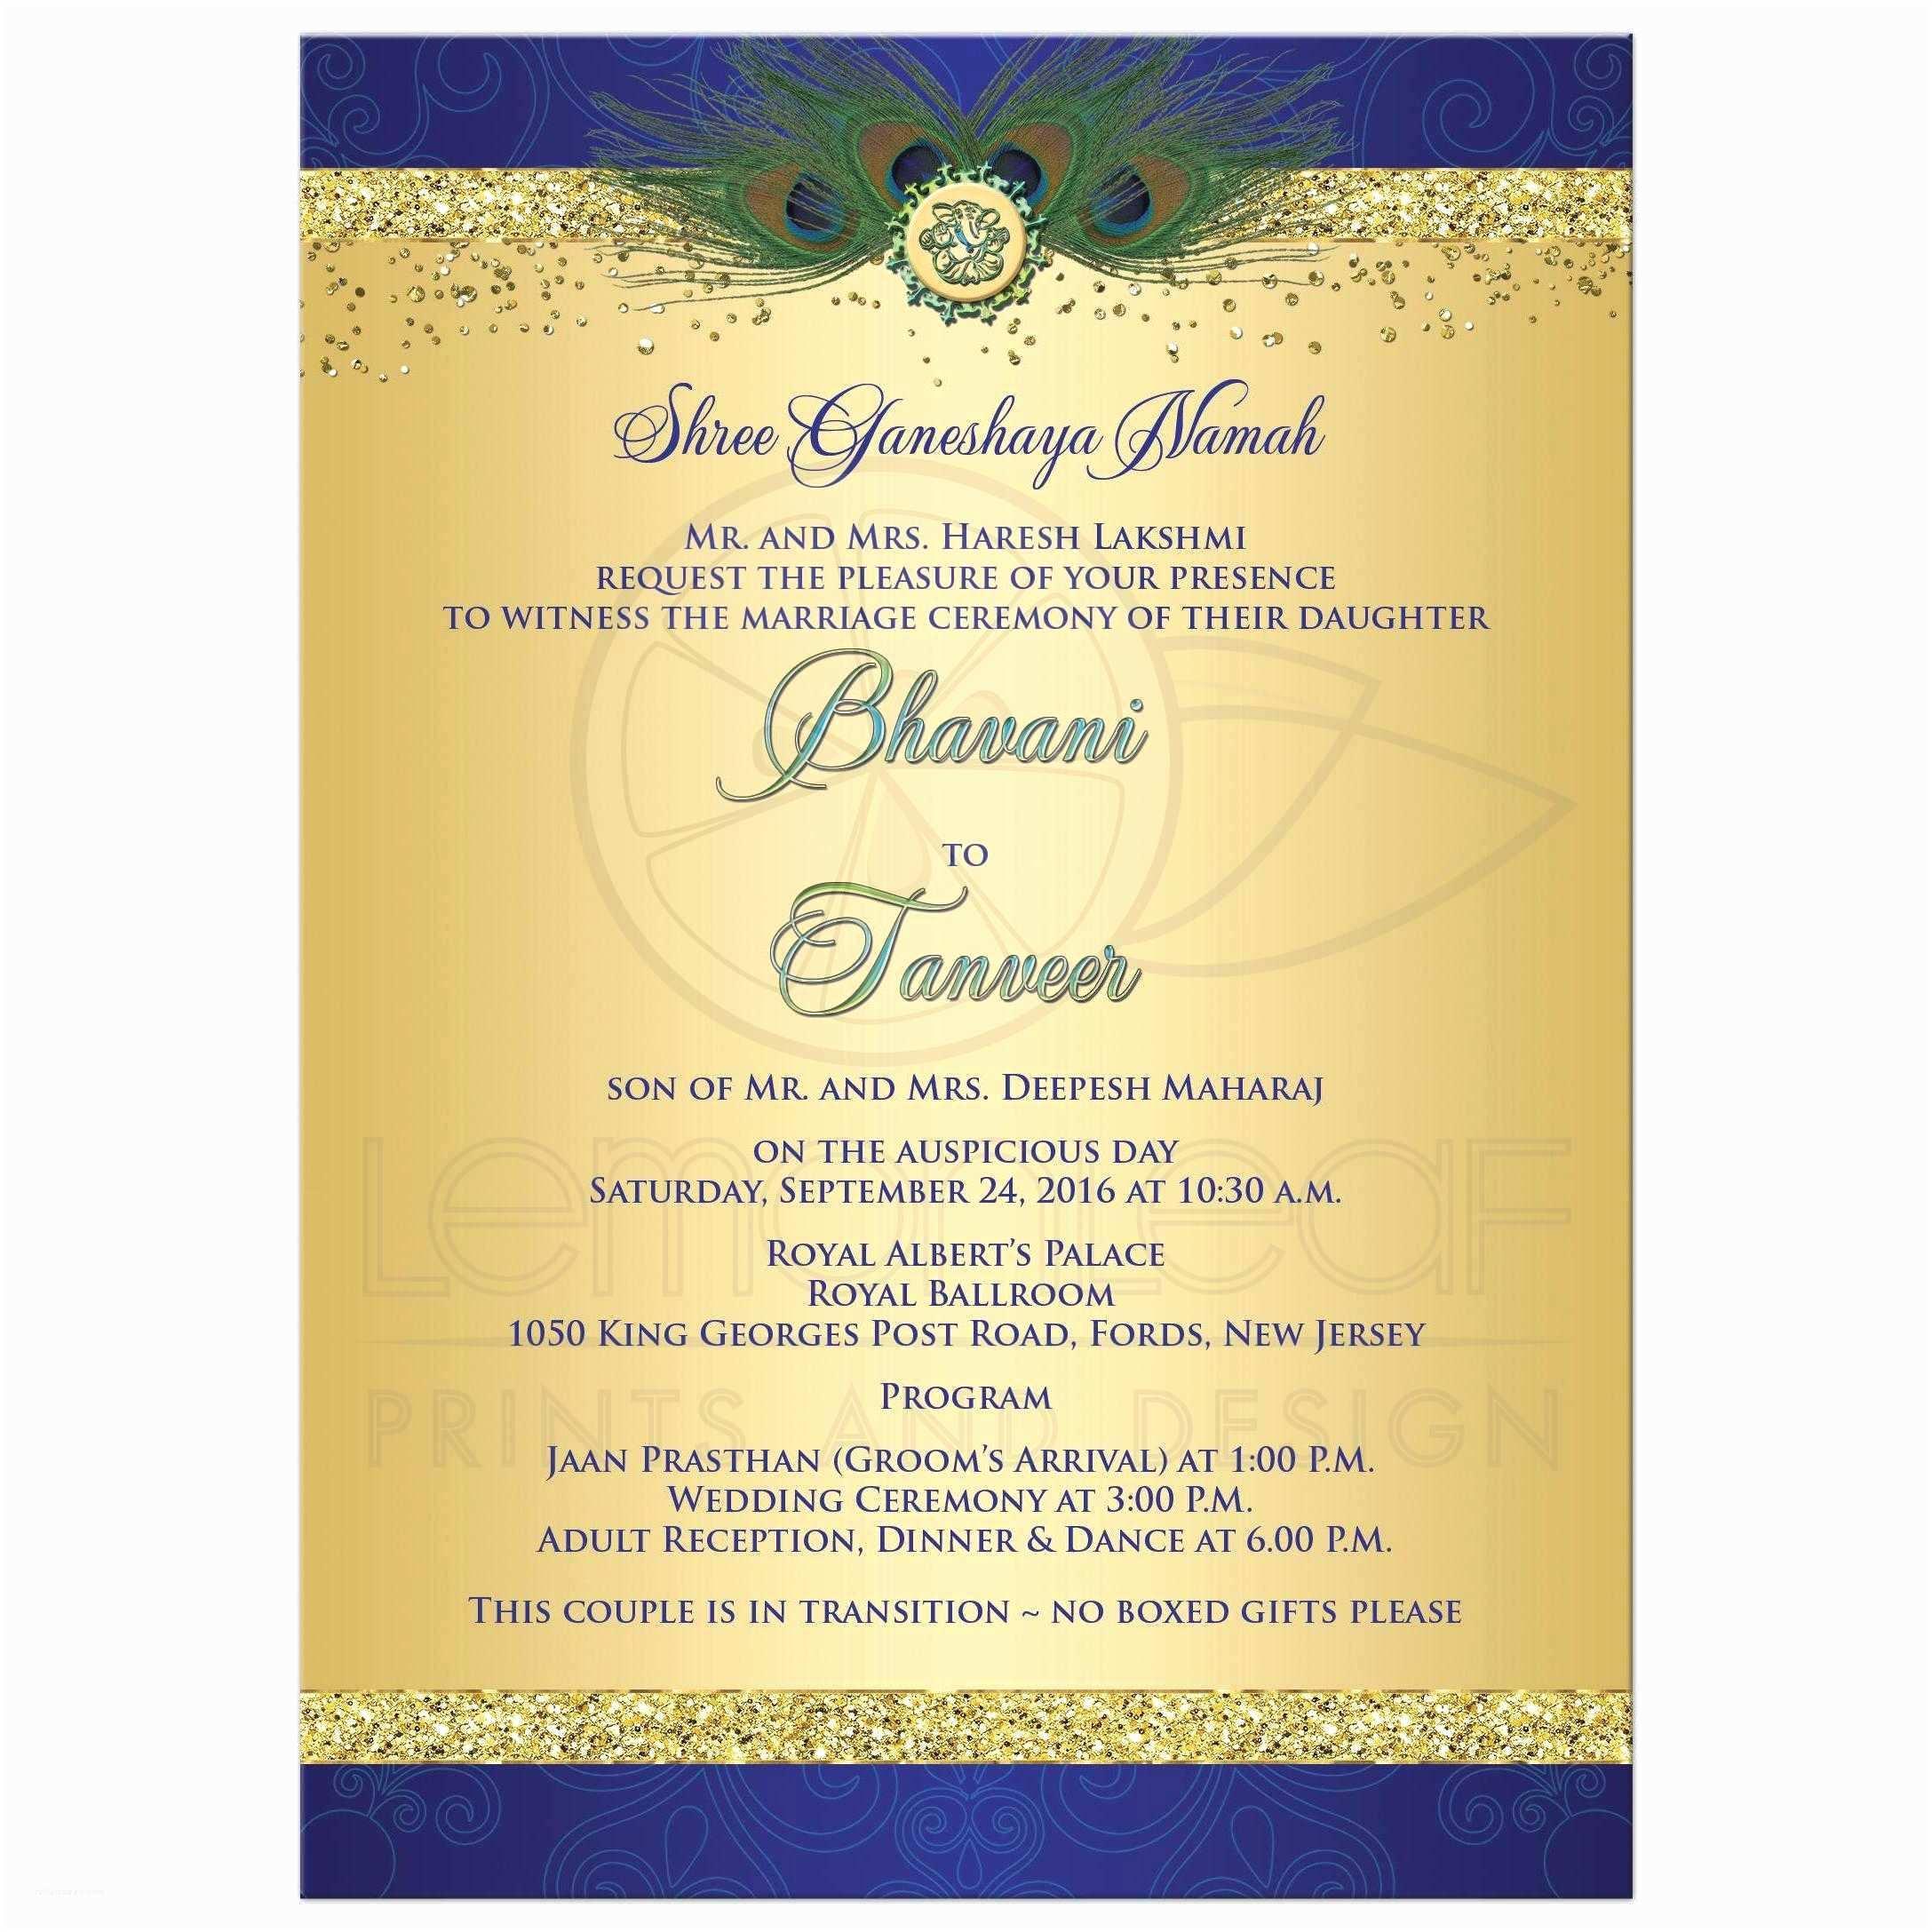 Indian Wedding Invitation Designs Free Download Indian Wedding Invitation Cards Indian Wedding